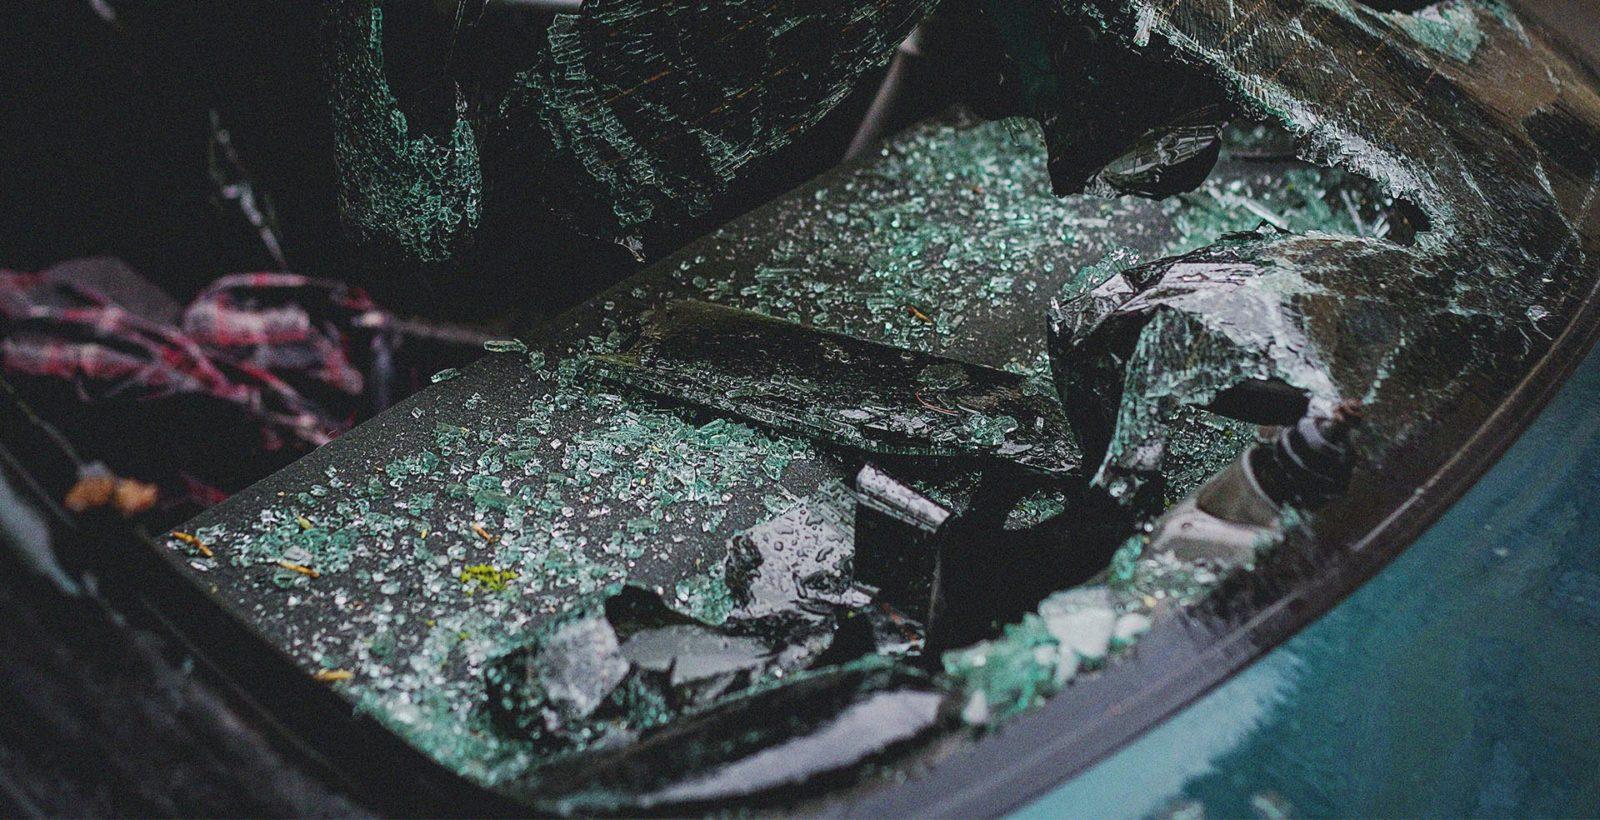 broken windshield of a vehicle